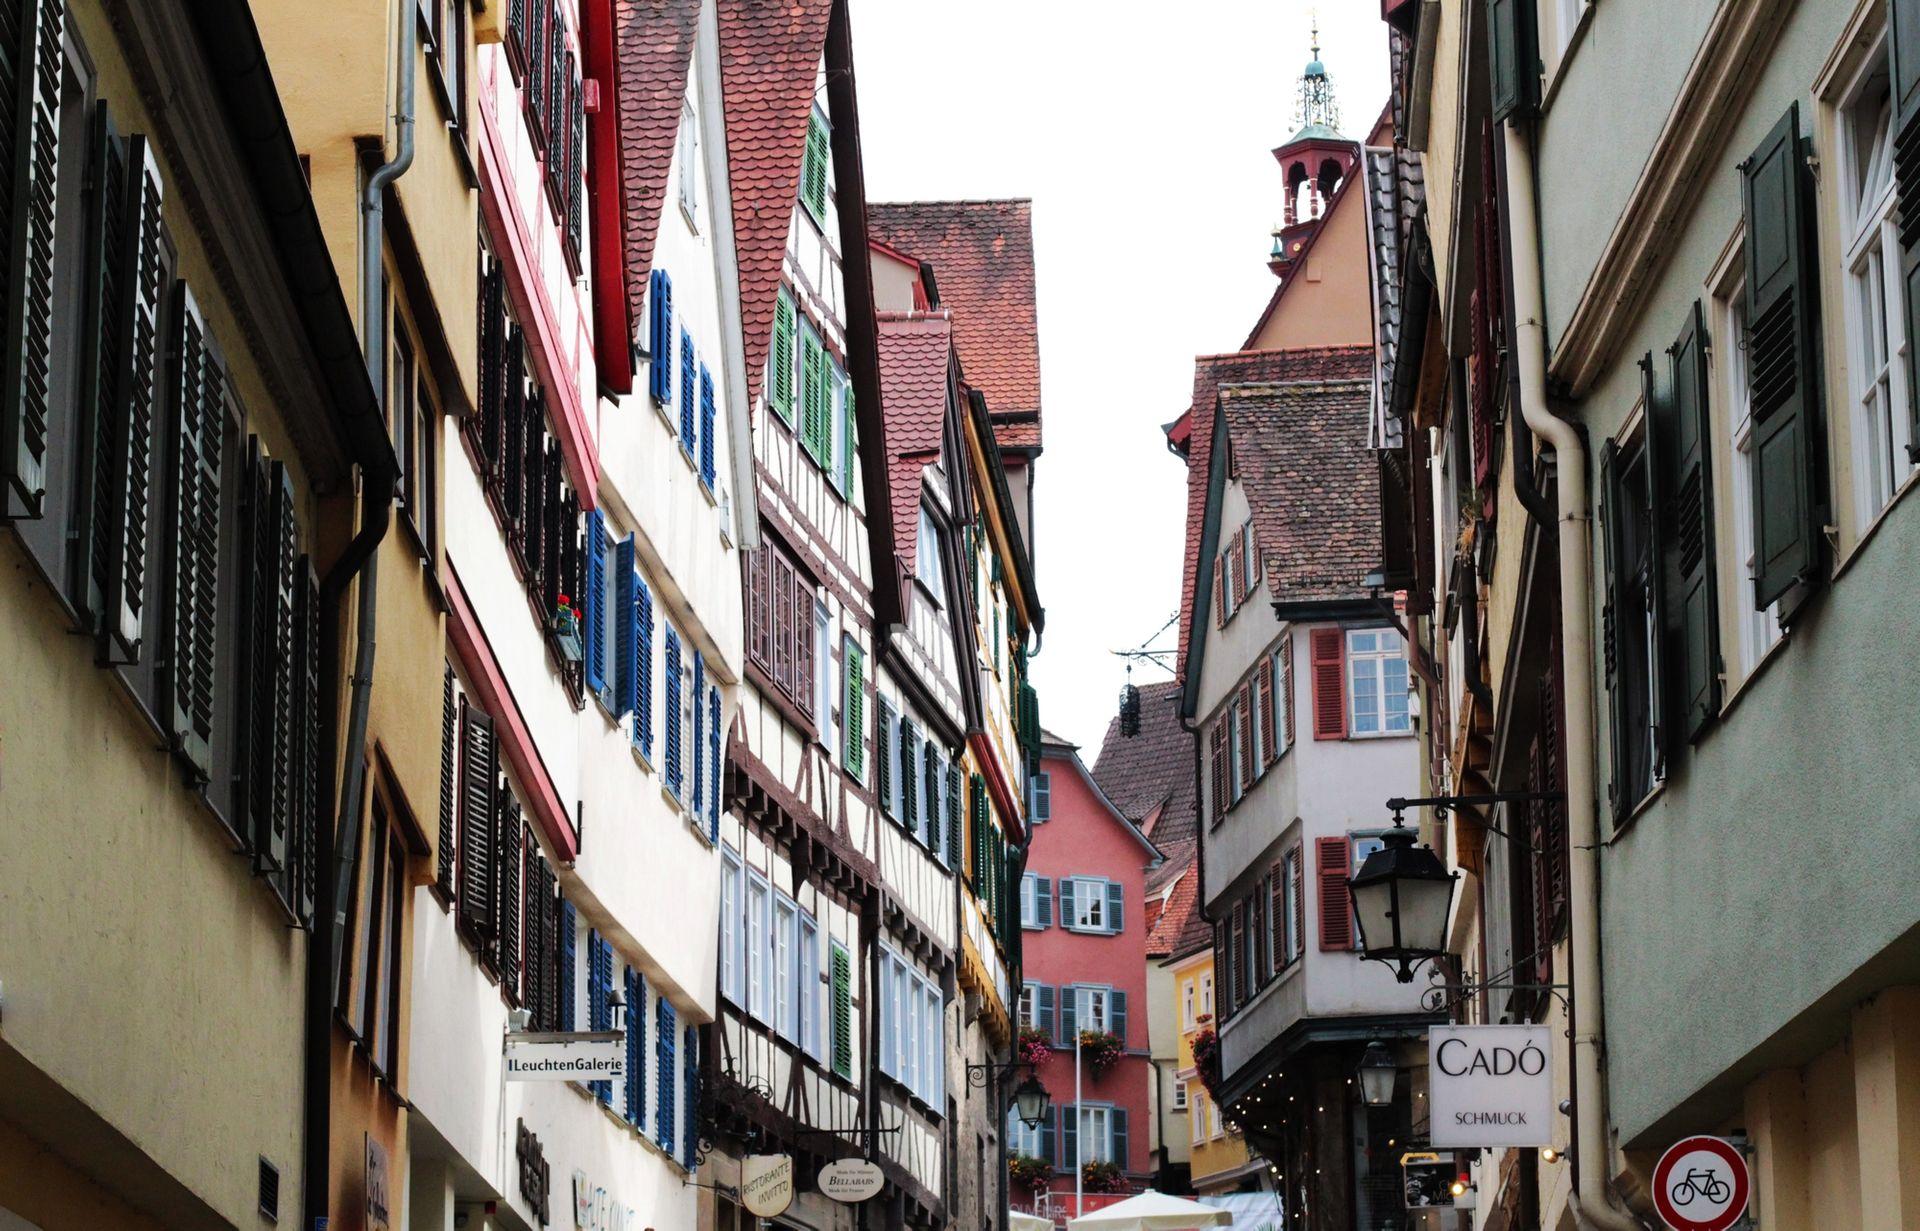 Anticimex Kammerjäger in Tübingen